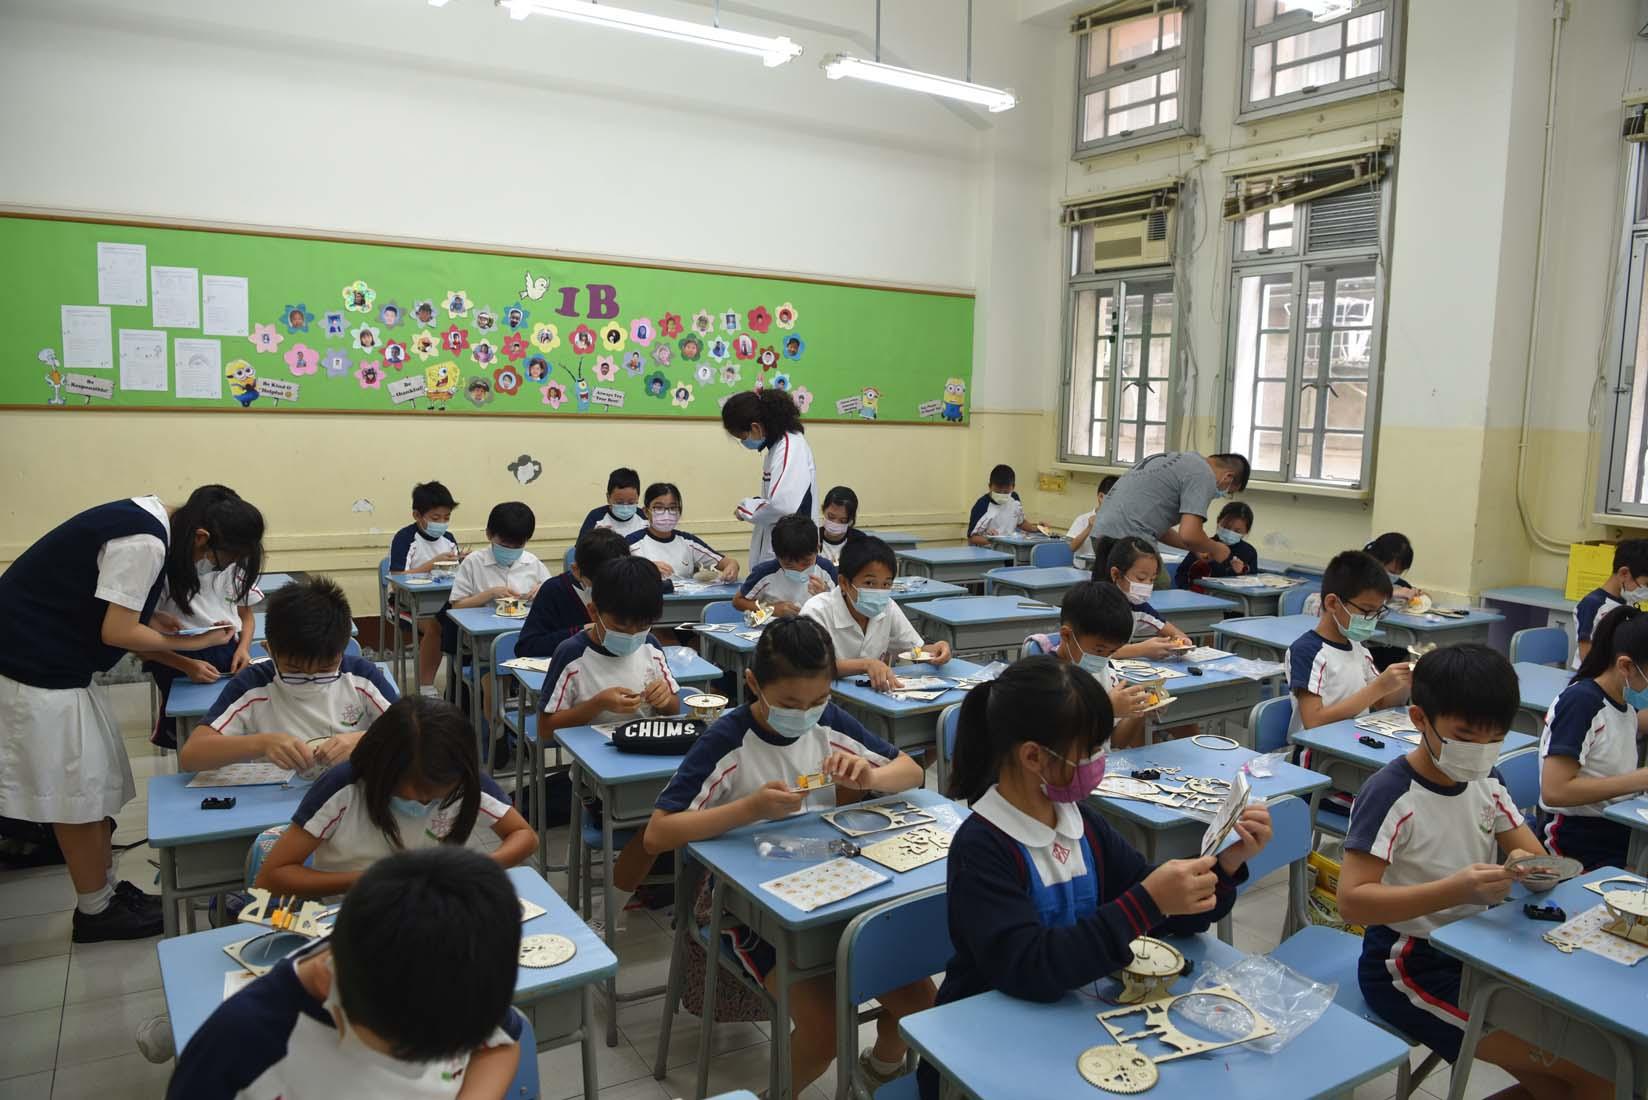 https://sfaeps.edu.hk/sites/default/files/dsc_0018.jpg